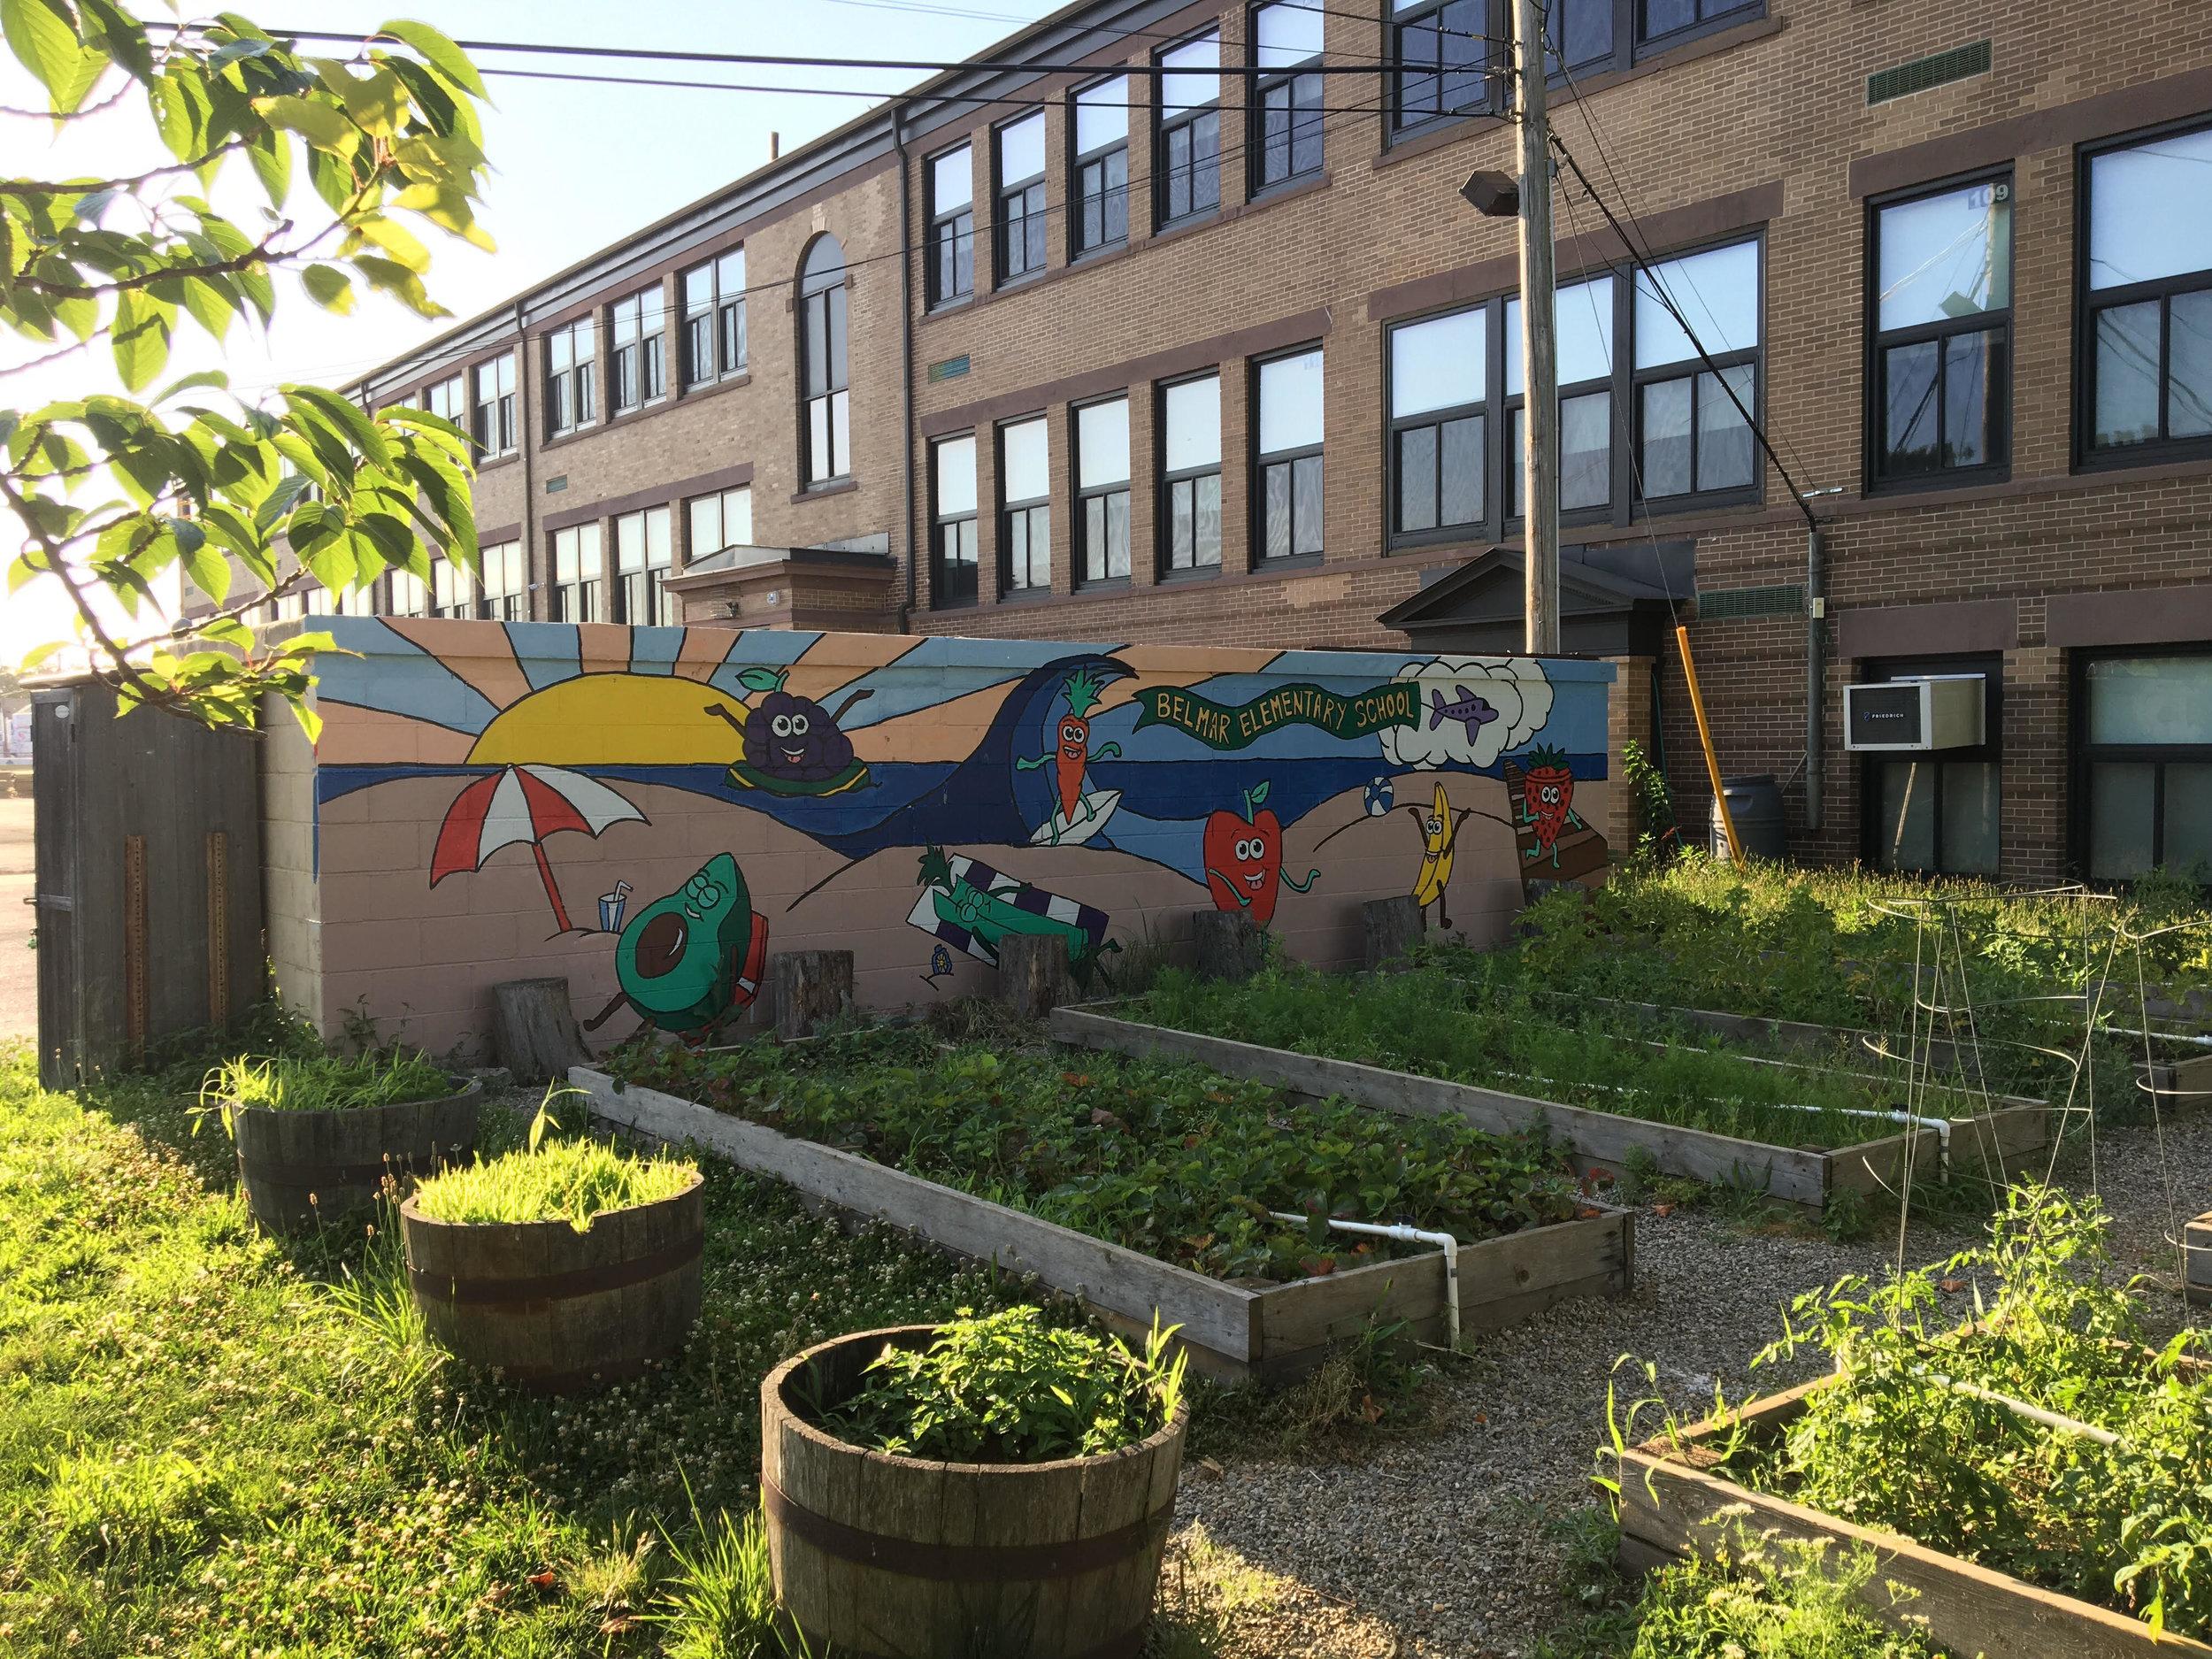 Belmar Elementary School - Belmar, New Jersey